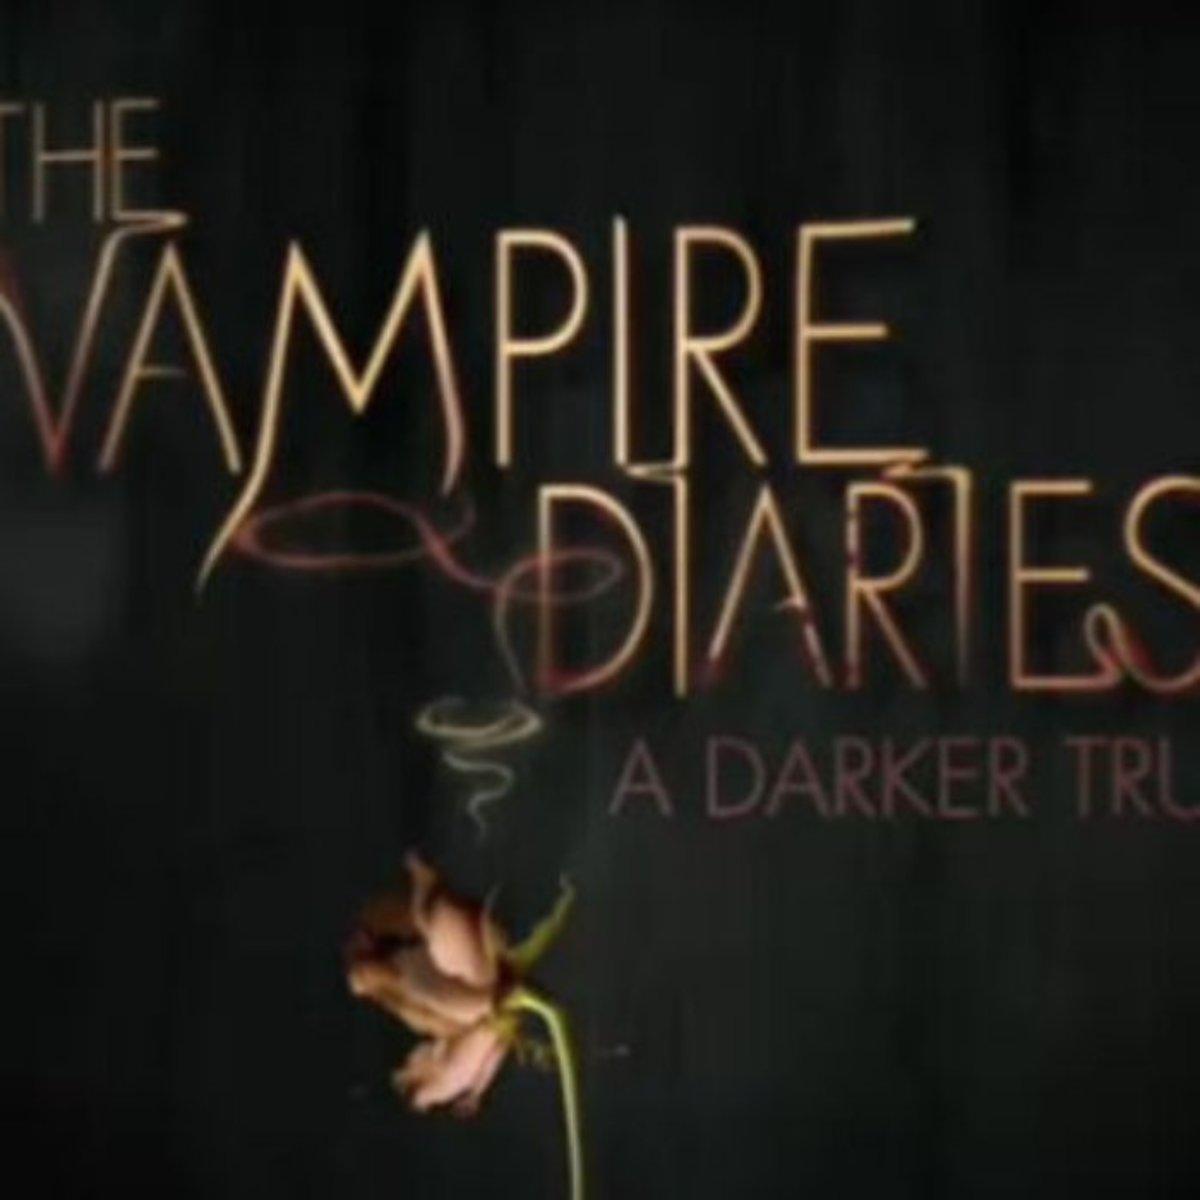 Vampire Diaries: A Darker Truth Poster